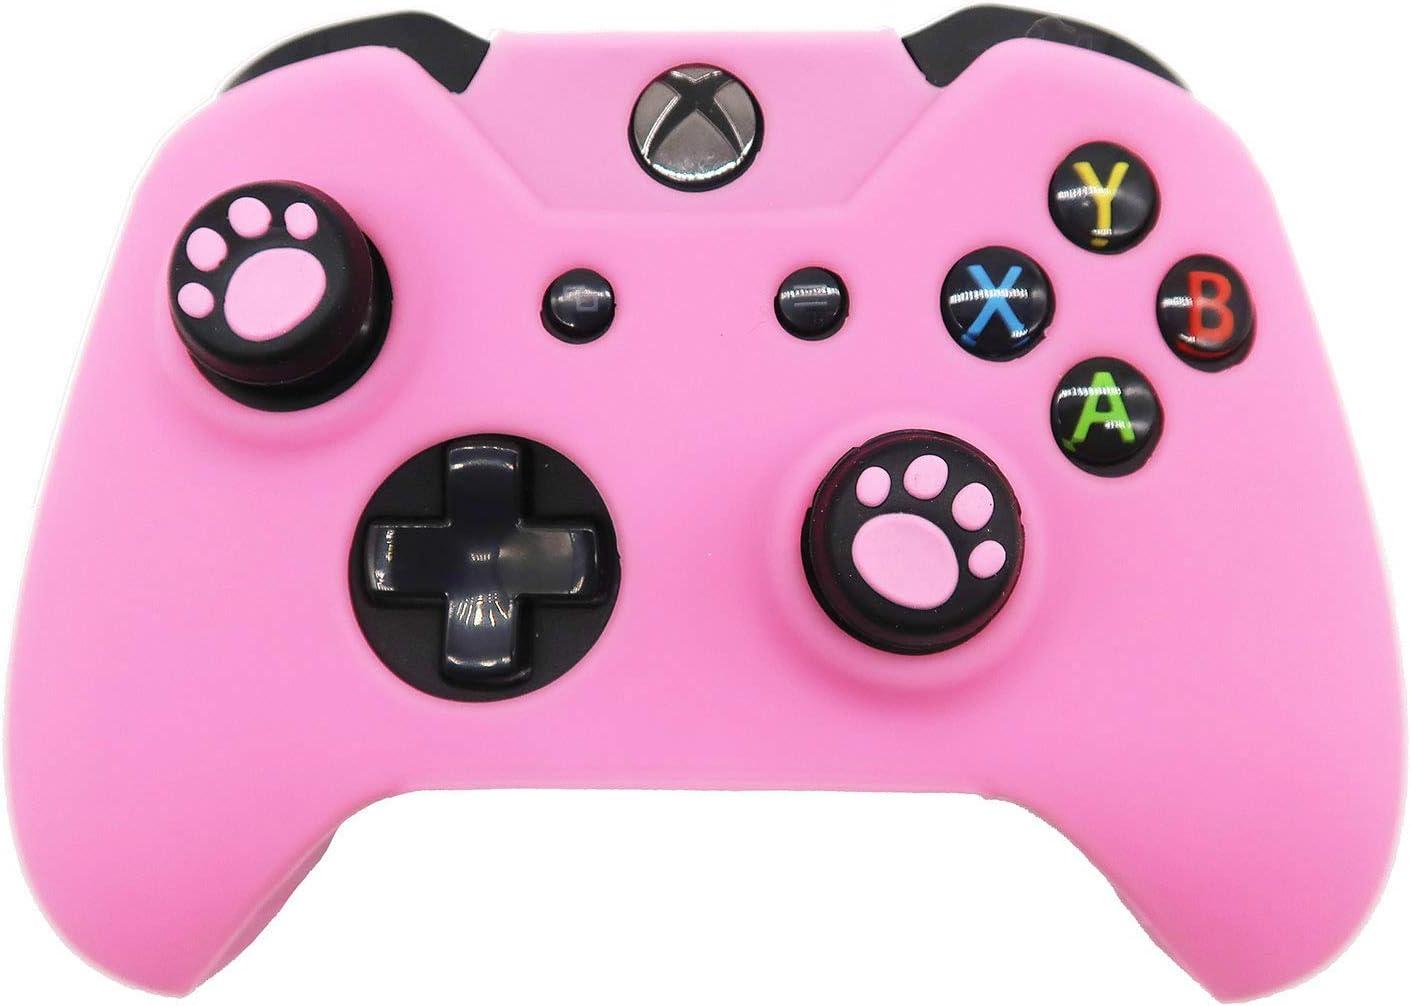 BRHE - Funda de Silicona Antideslizante para Mando de Xbox One, Color Rosa: Amazon.es: Electrónica